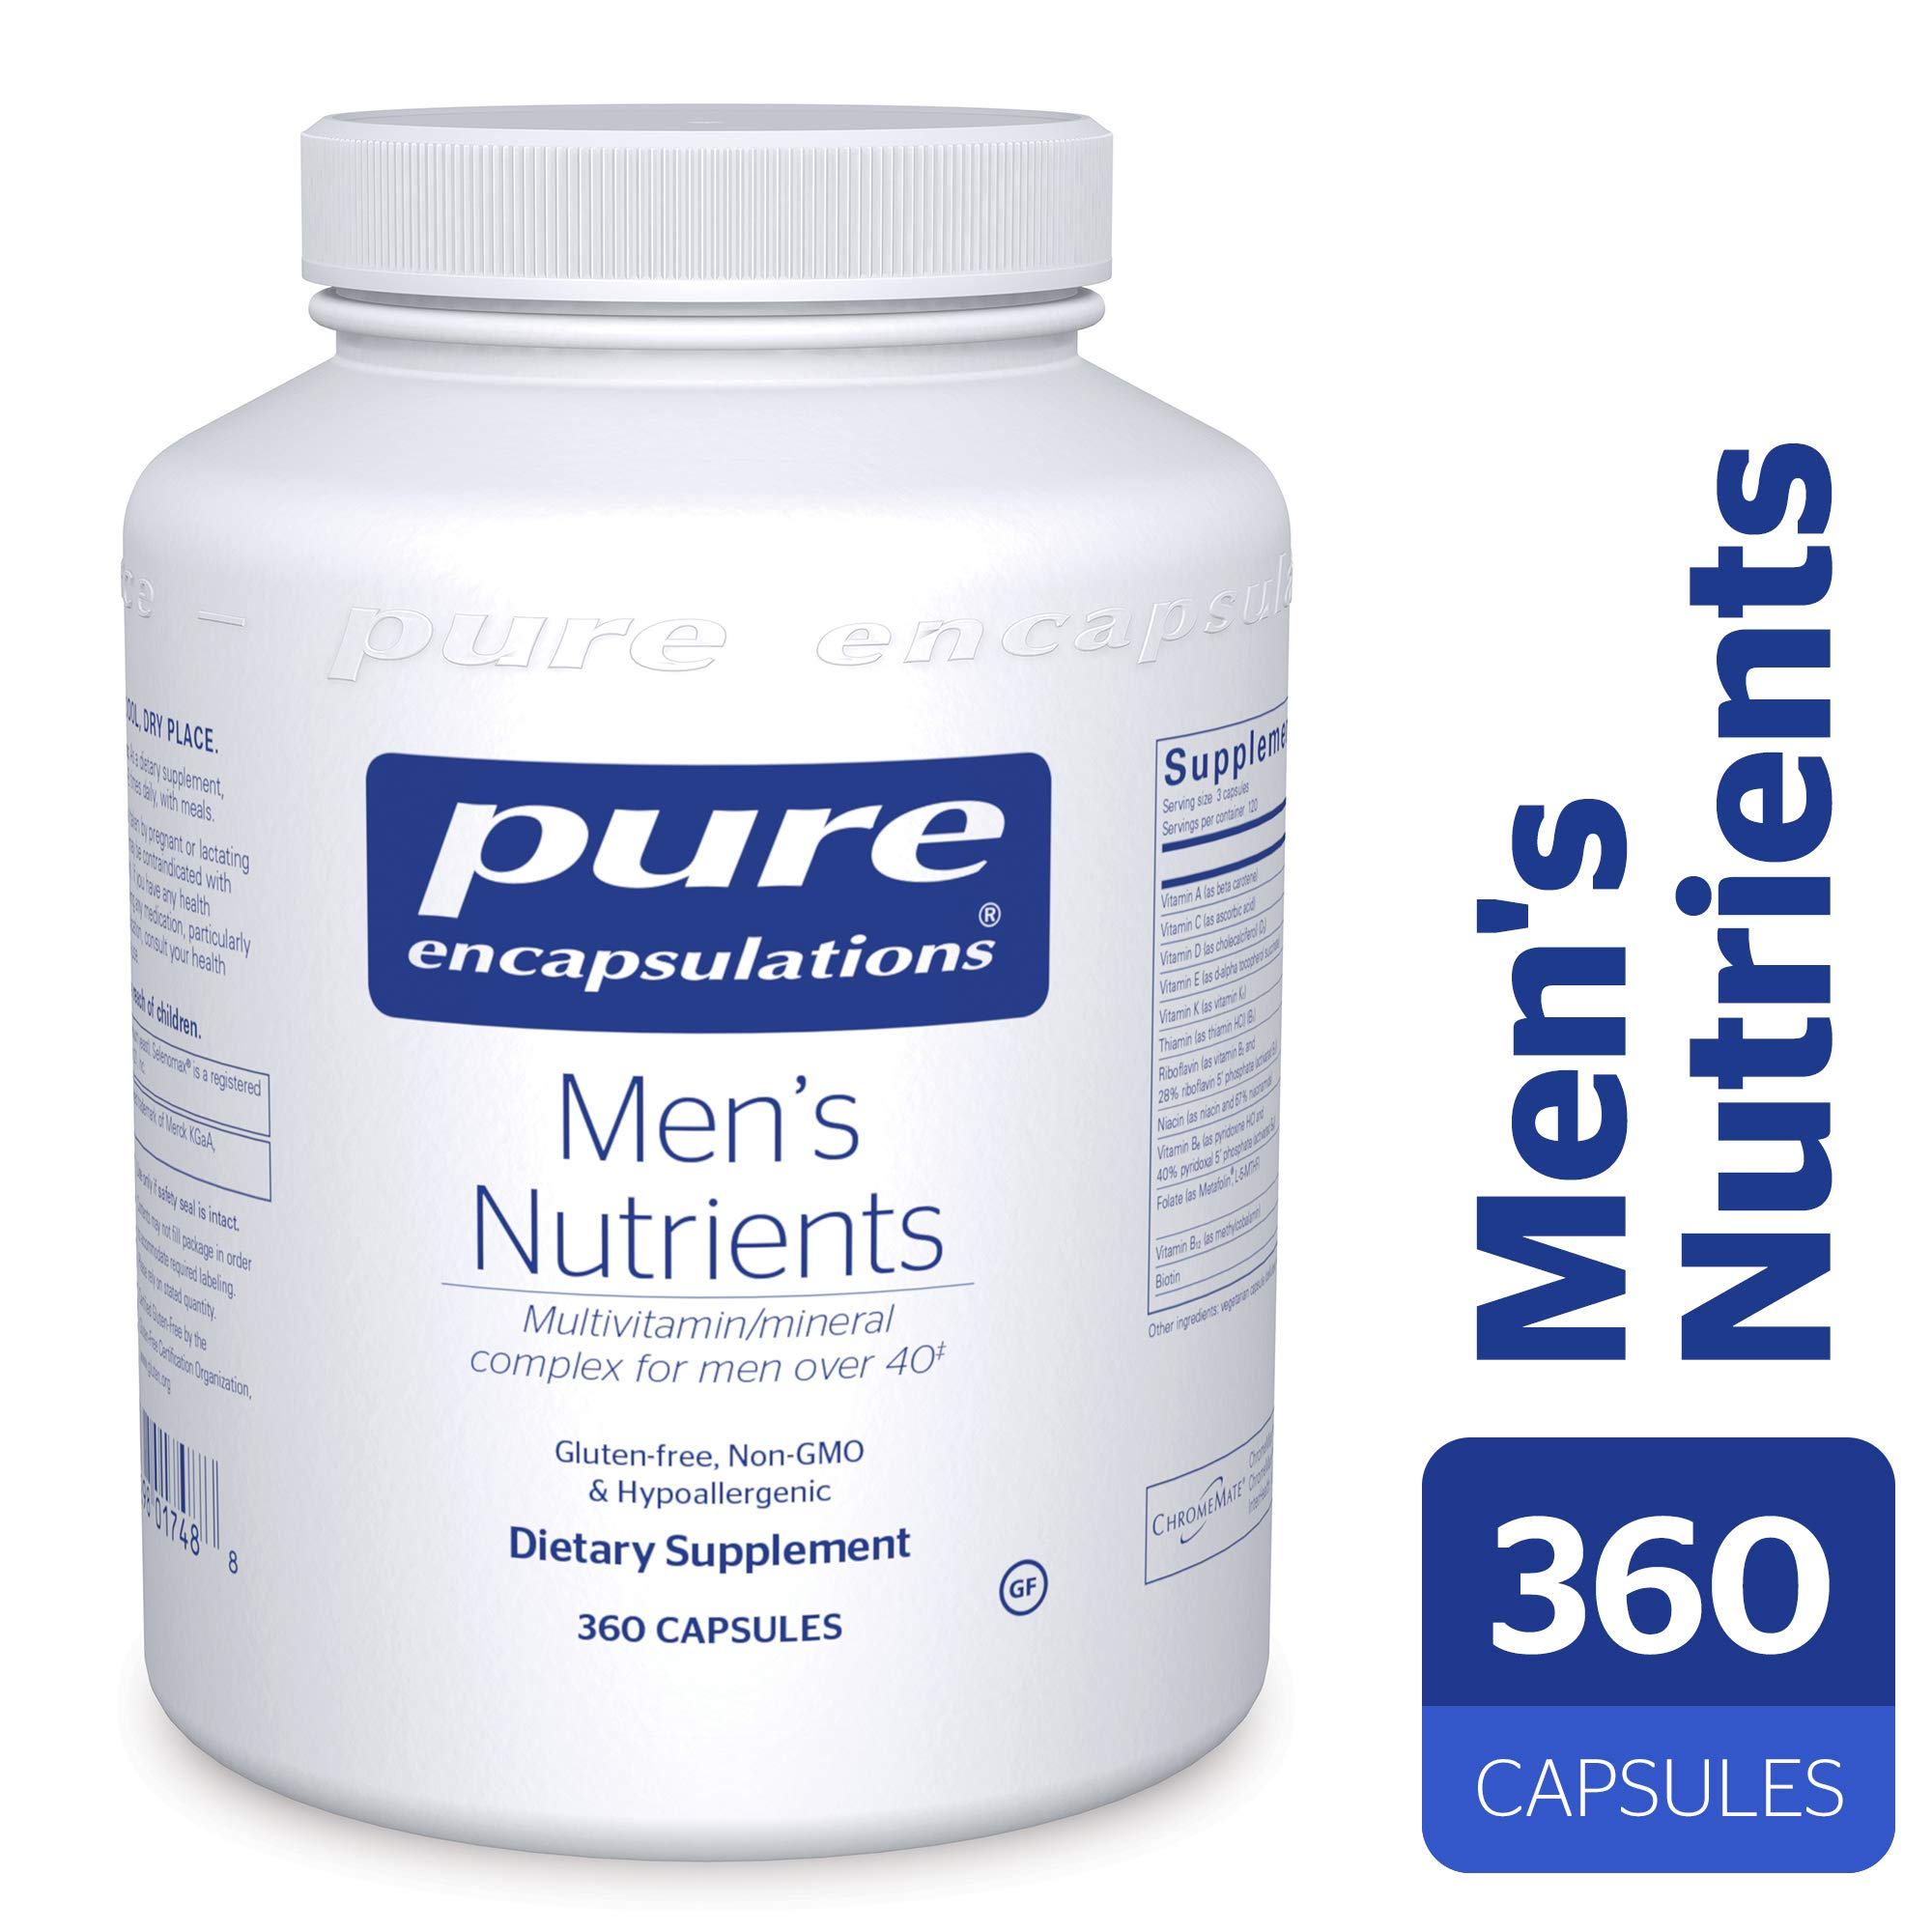 Pure Encapsulations - Men's Nutrients - Hypoallergenic Multivitamin/Mineral Complex for Men Over 40-360 Capsules